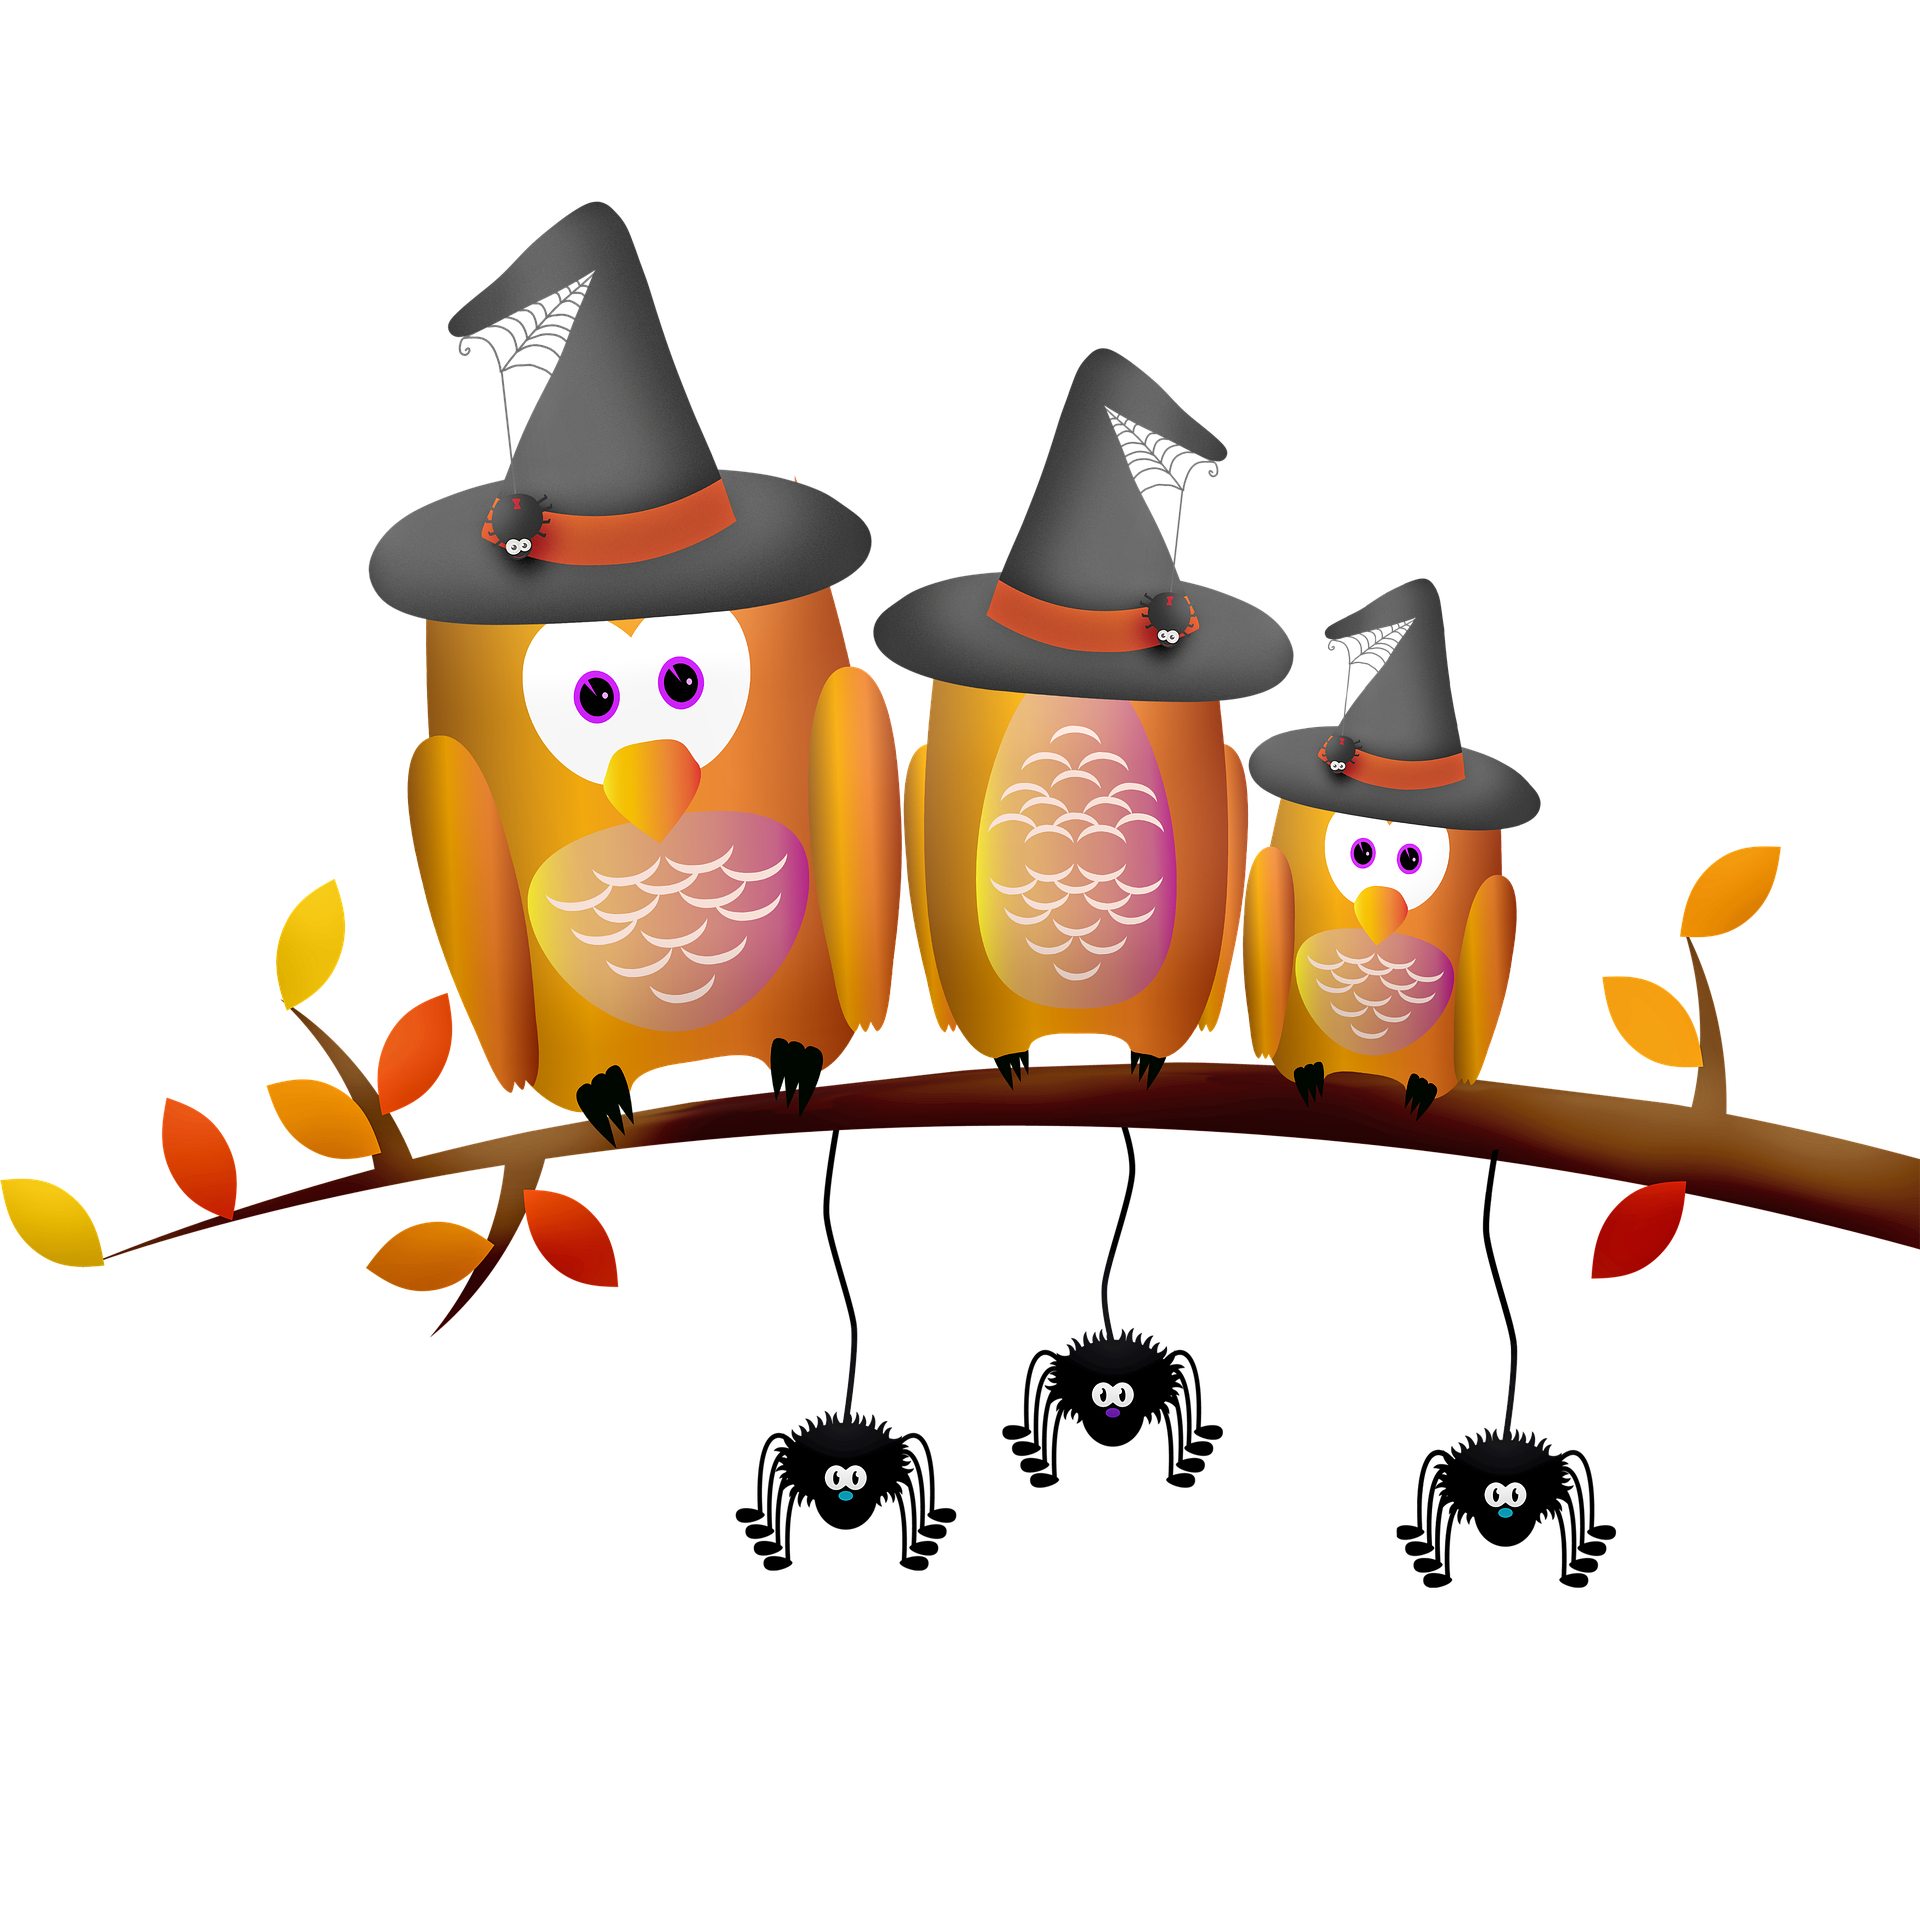 halloween-decorations-5659131_1920